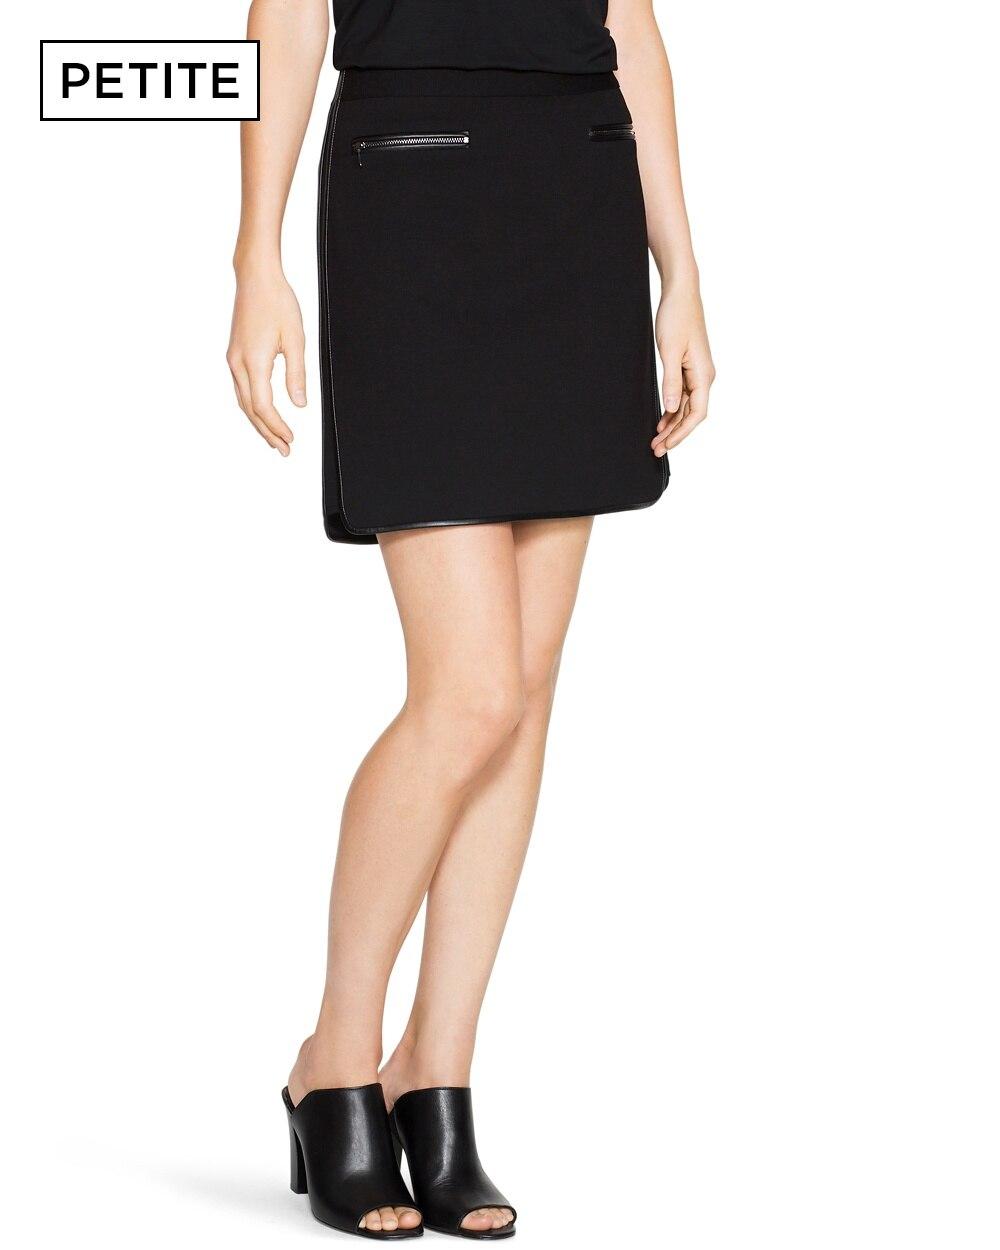 19708018f0 Petite Ponte Mini Skirt - White House Black Market